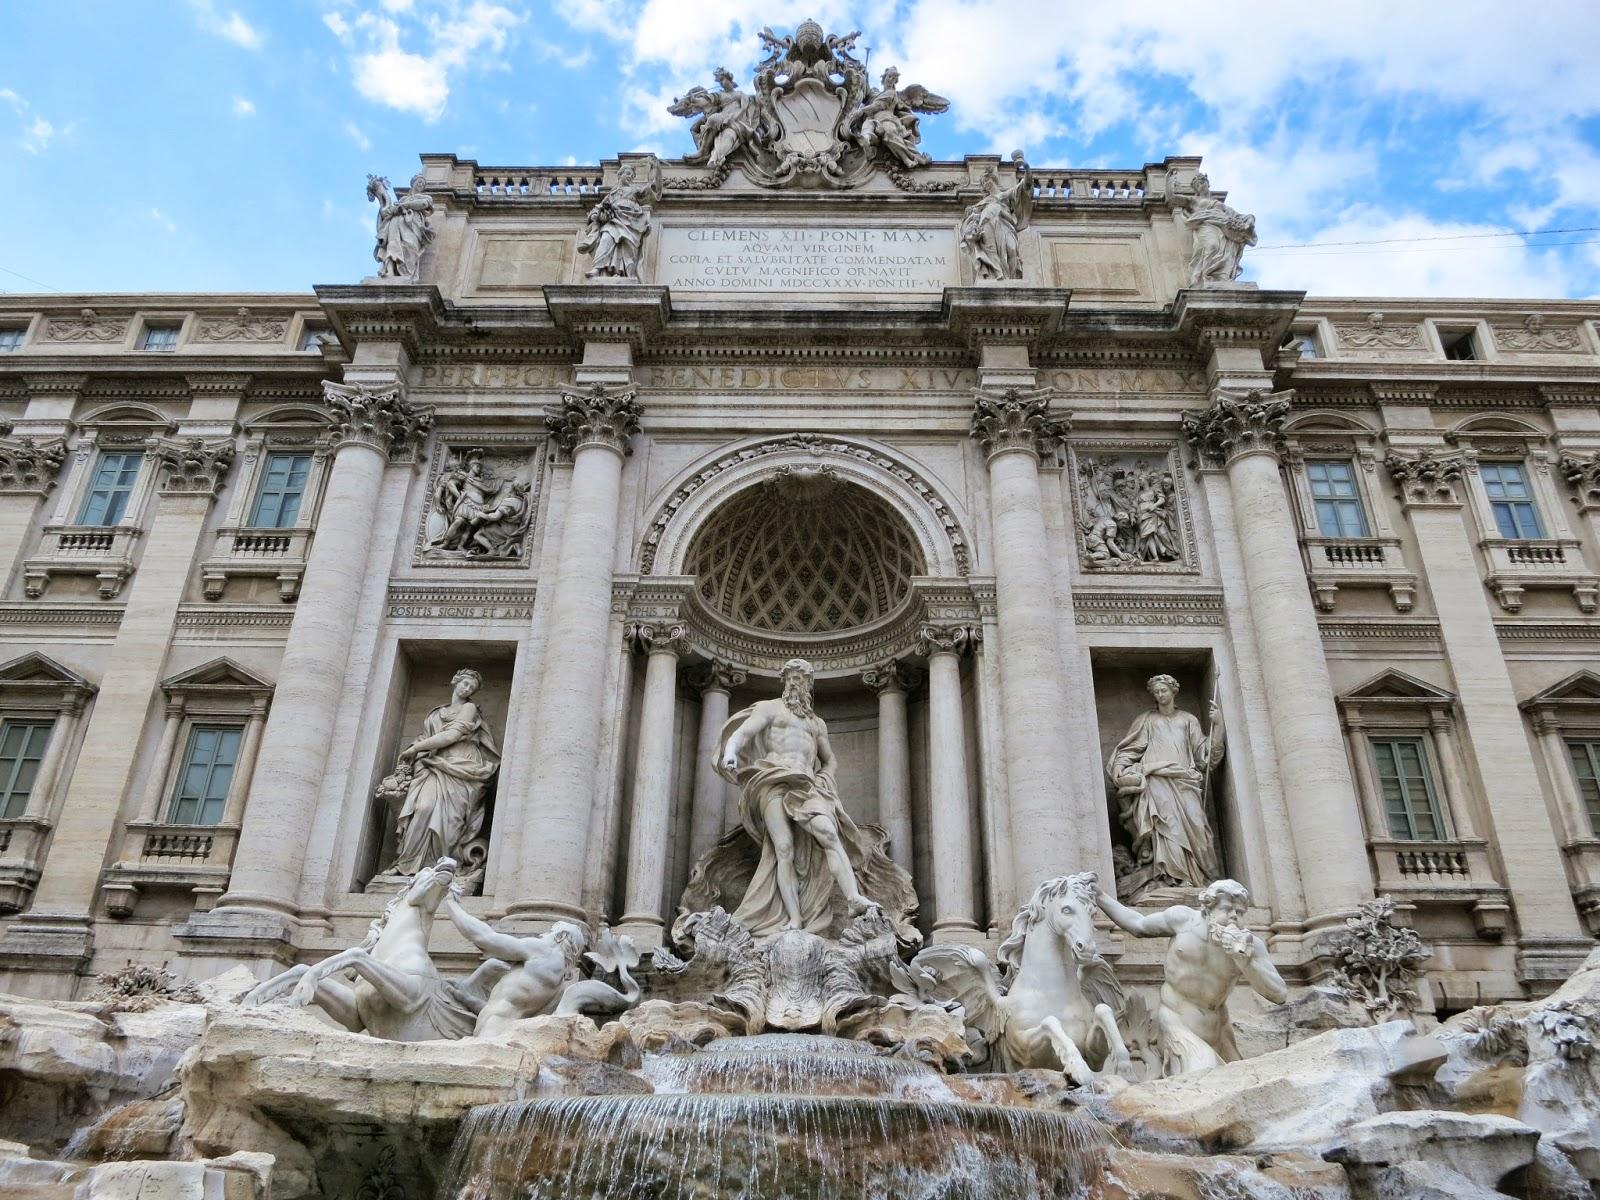 Leonardo旅遊小記: 義大利(2013/04/23)二 羅馬經典行 萬神殿(Pantheon)